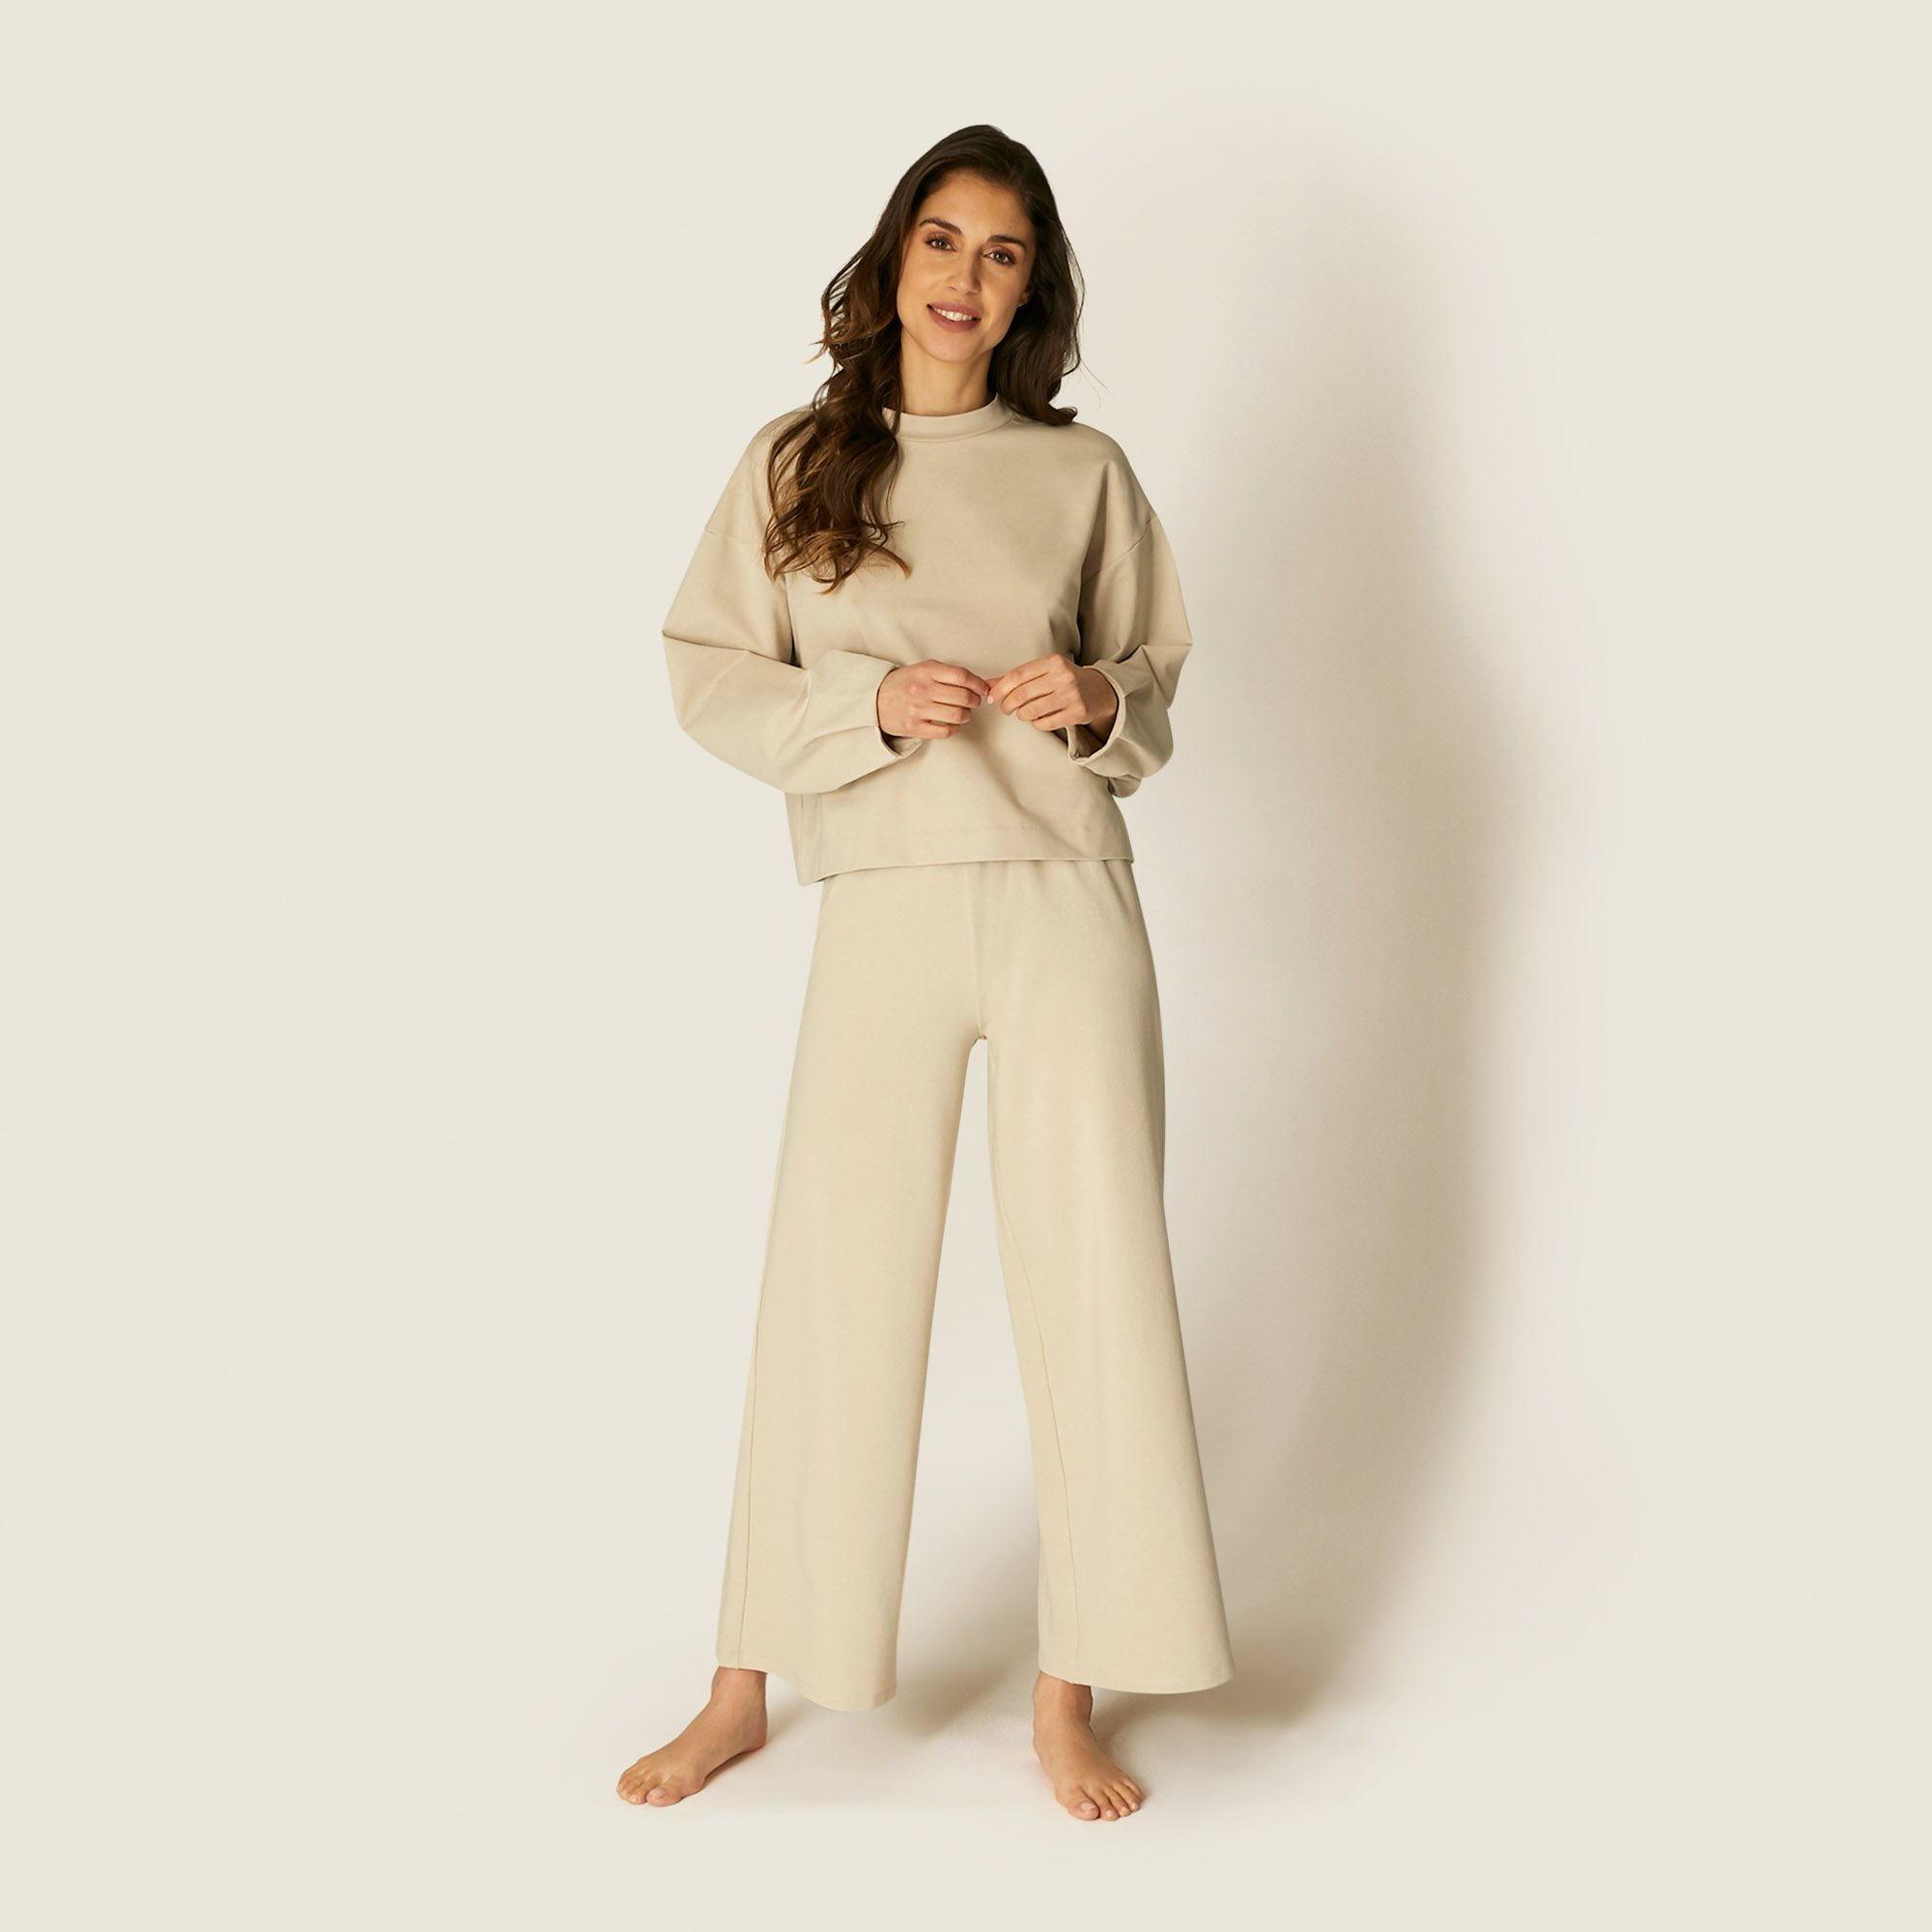 yamamay-homewear-Comfort-Zone-fashion-modnialmanah